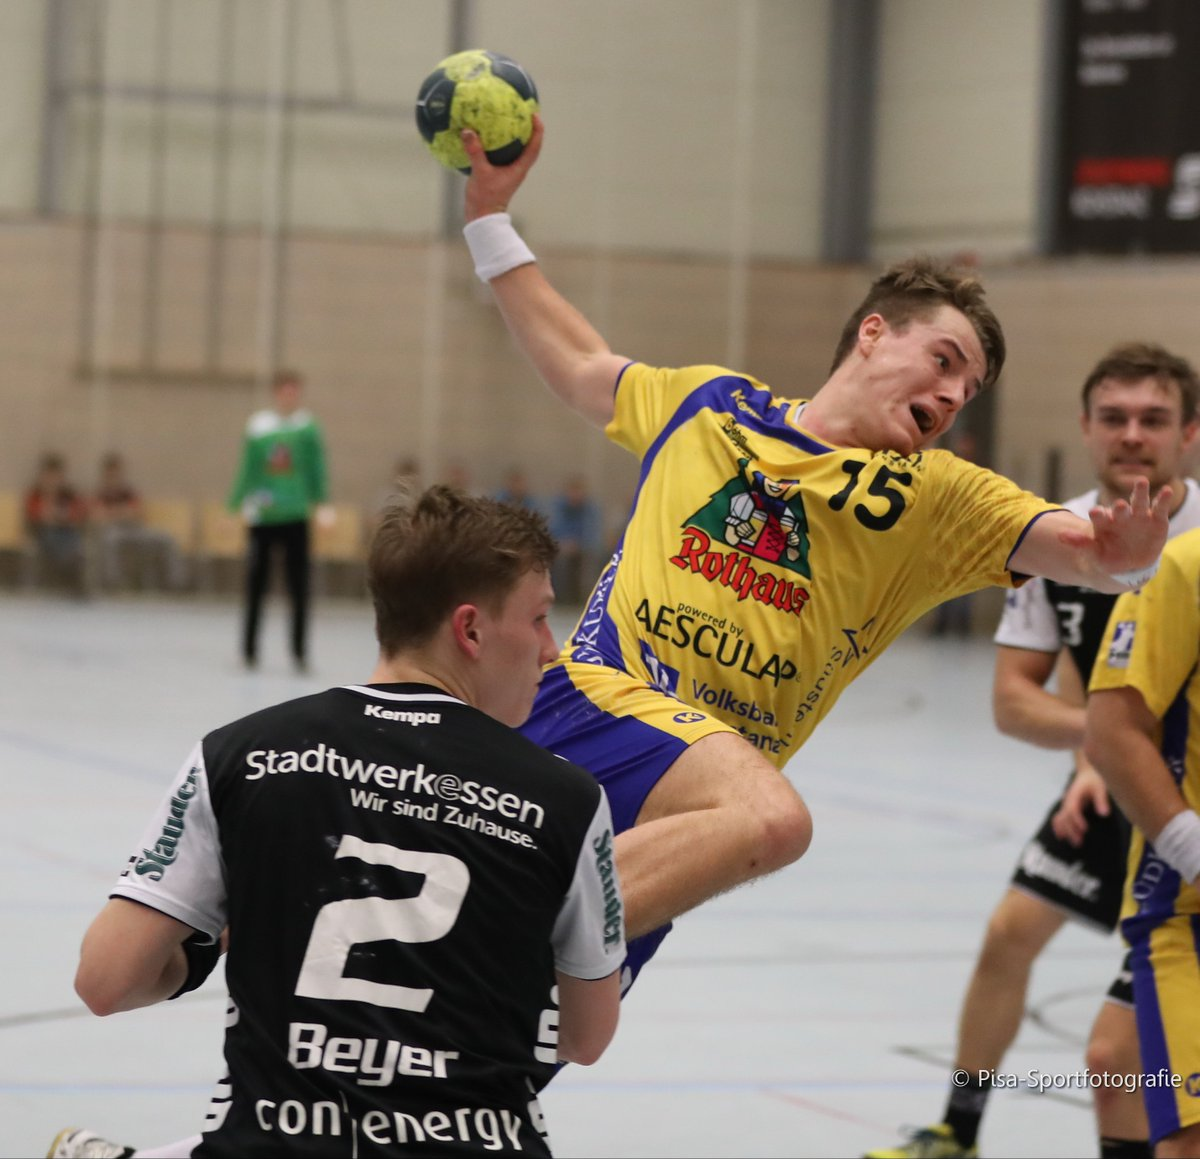 #HSGKonstanz vergibt große Chance bei @TUSEMHandball  https://t.co/idv6bnbhmb #Konstanz #Handball #Sport #HSG #2HBL https://t.co/jIBRA0o1GA